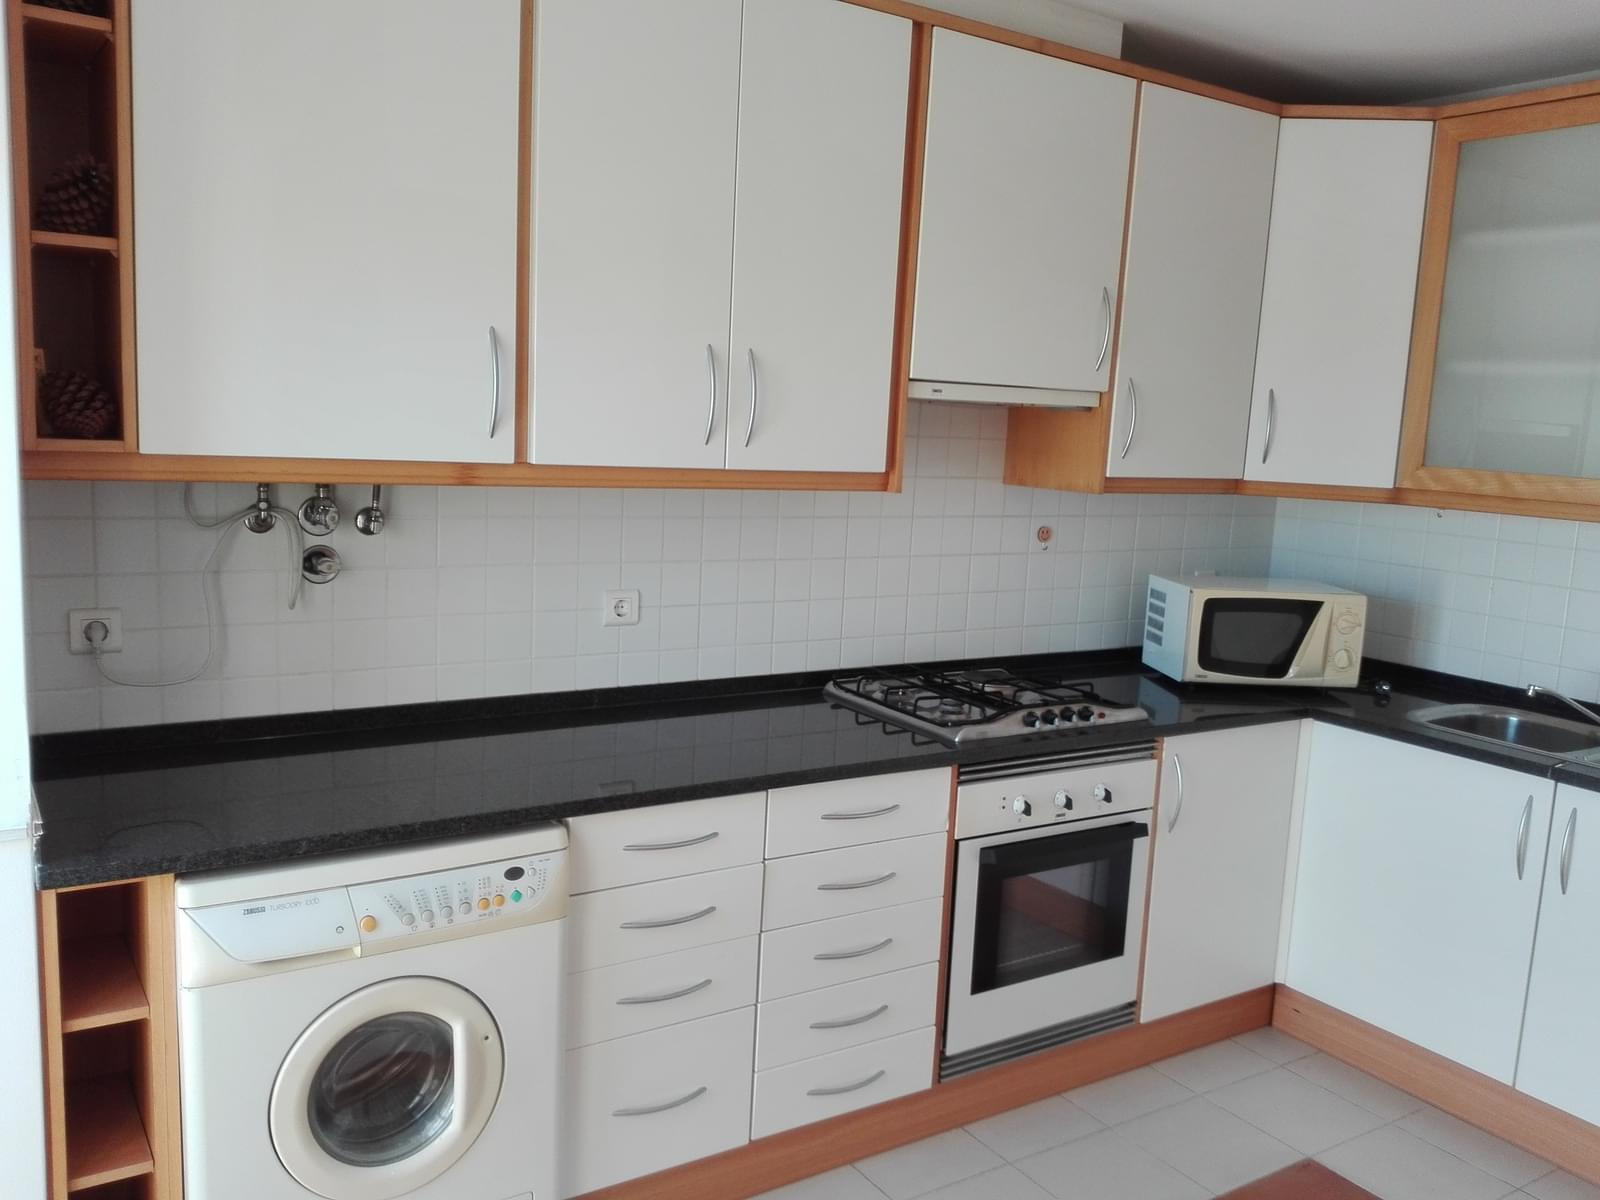 pf17908-apartamento-t1-lisboa-90f39a5b-1d04-4838-9f8a-3f19b16782a9